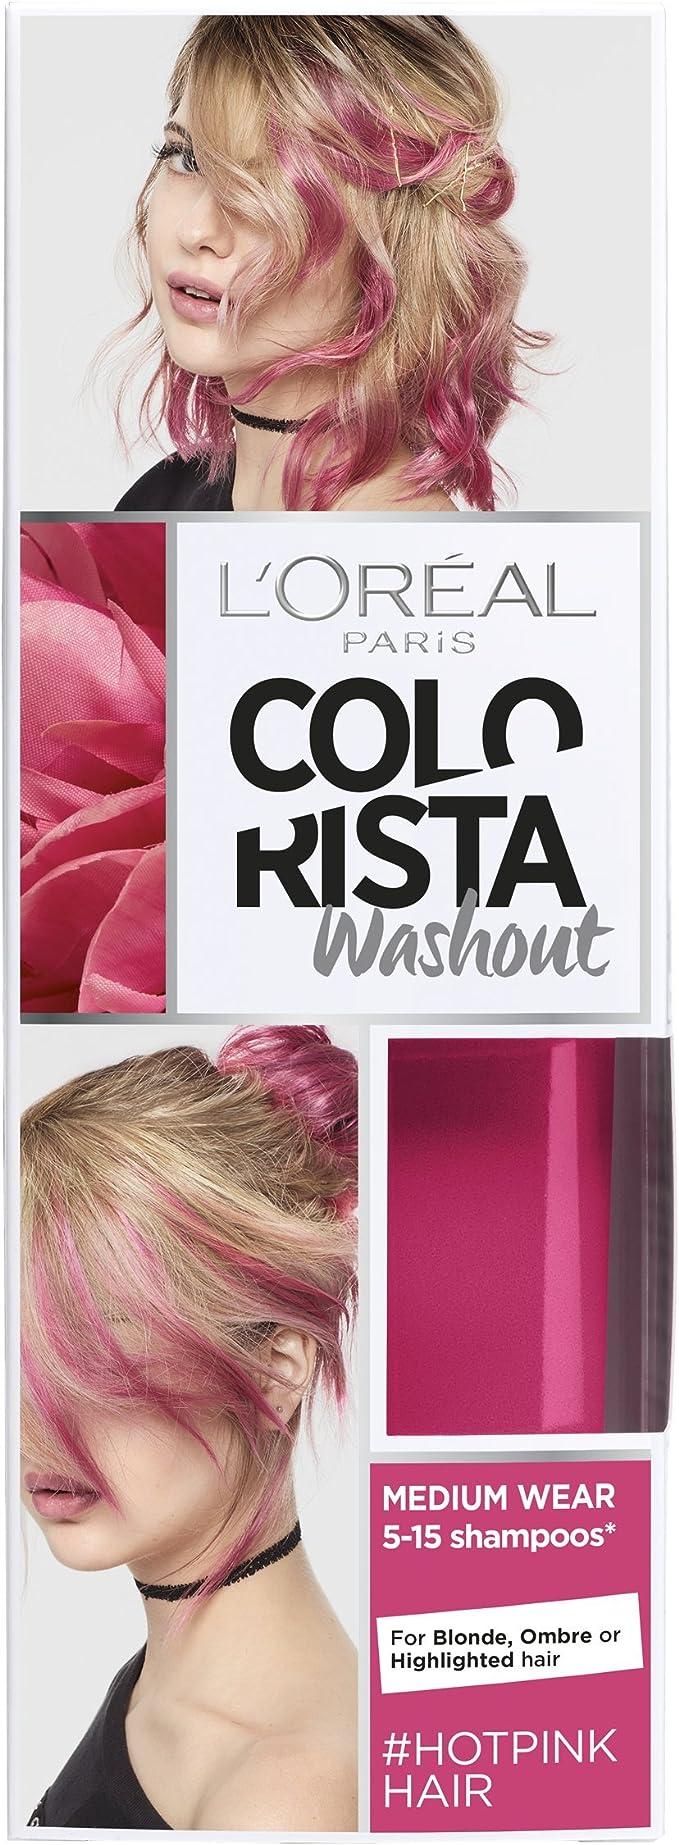 L Oreal colorista lavado caliente rosa neón semipermanente pelo, 80 ml